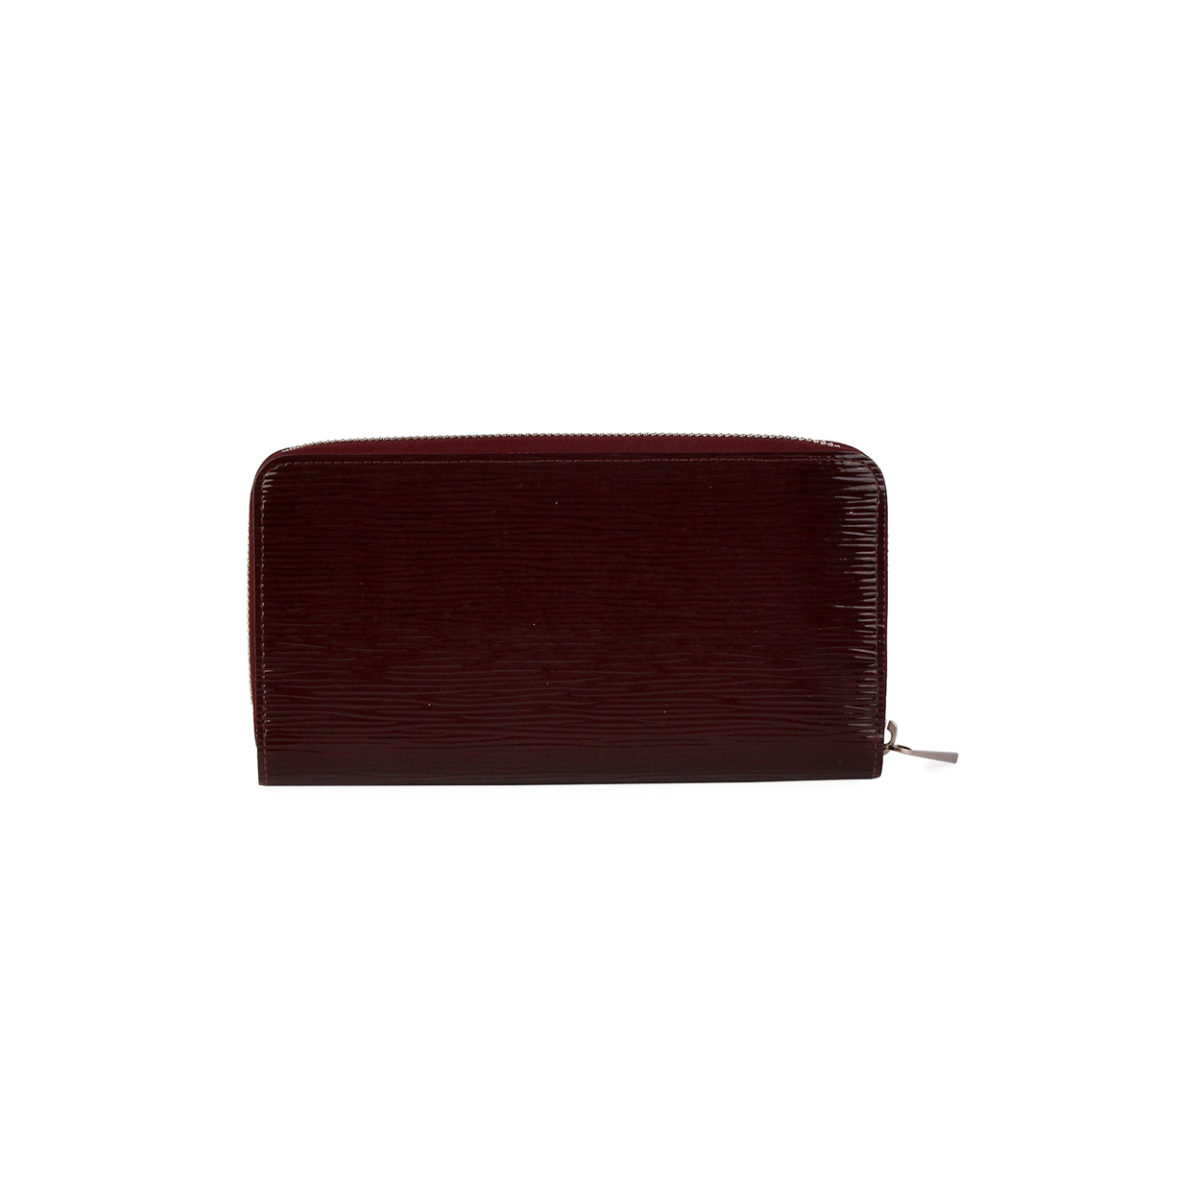 LOUIS VUITTON Epi Leather Zippy Wallet Amarante   Luxity fb67e4de9e8